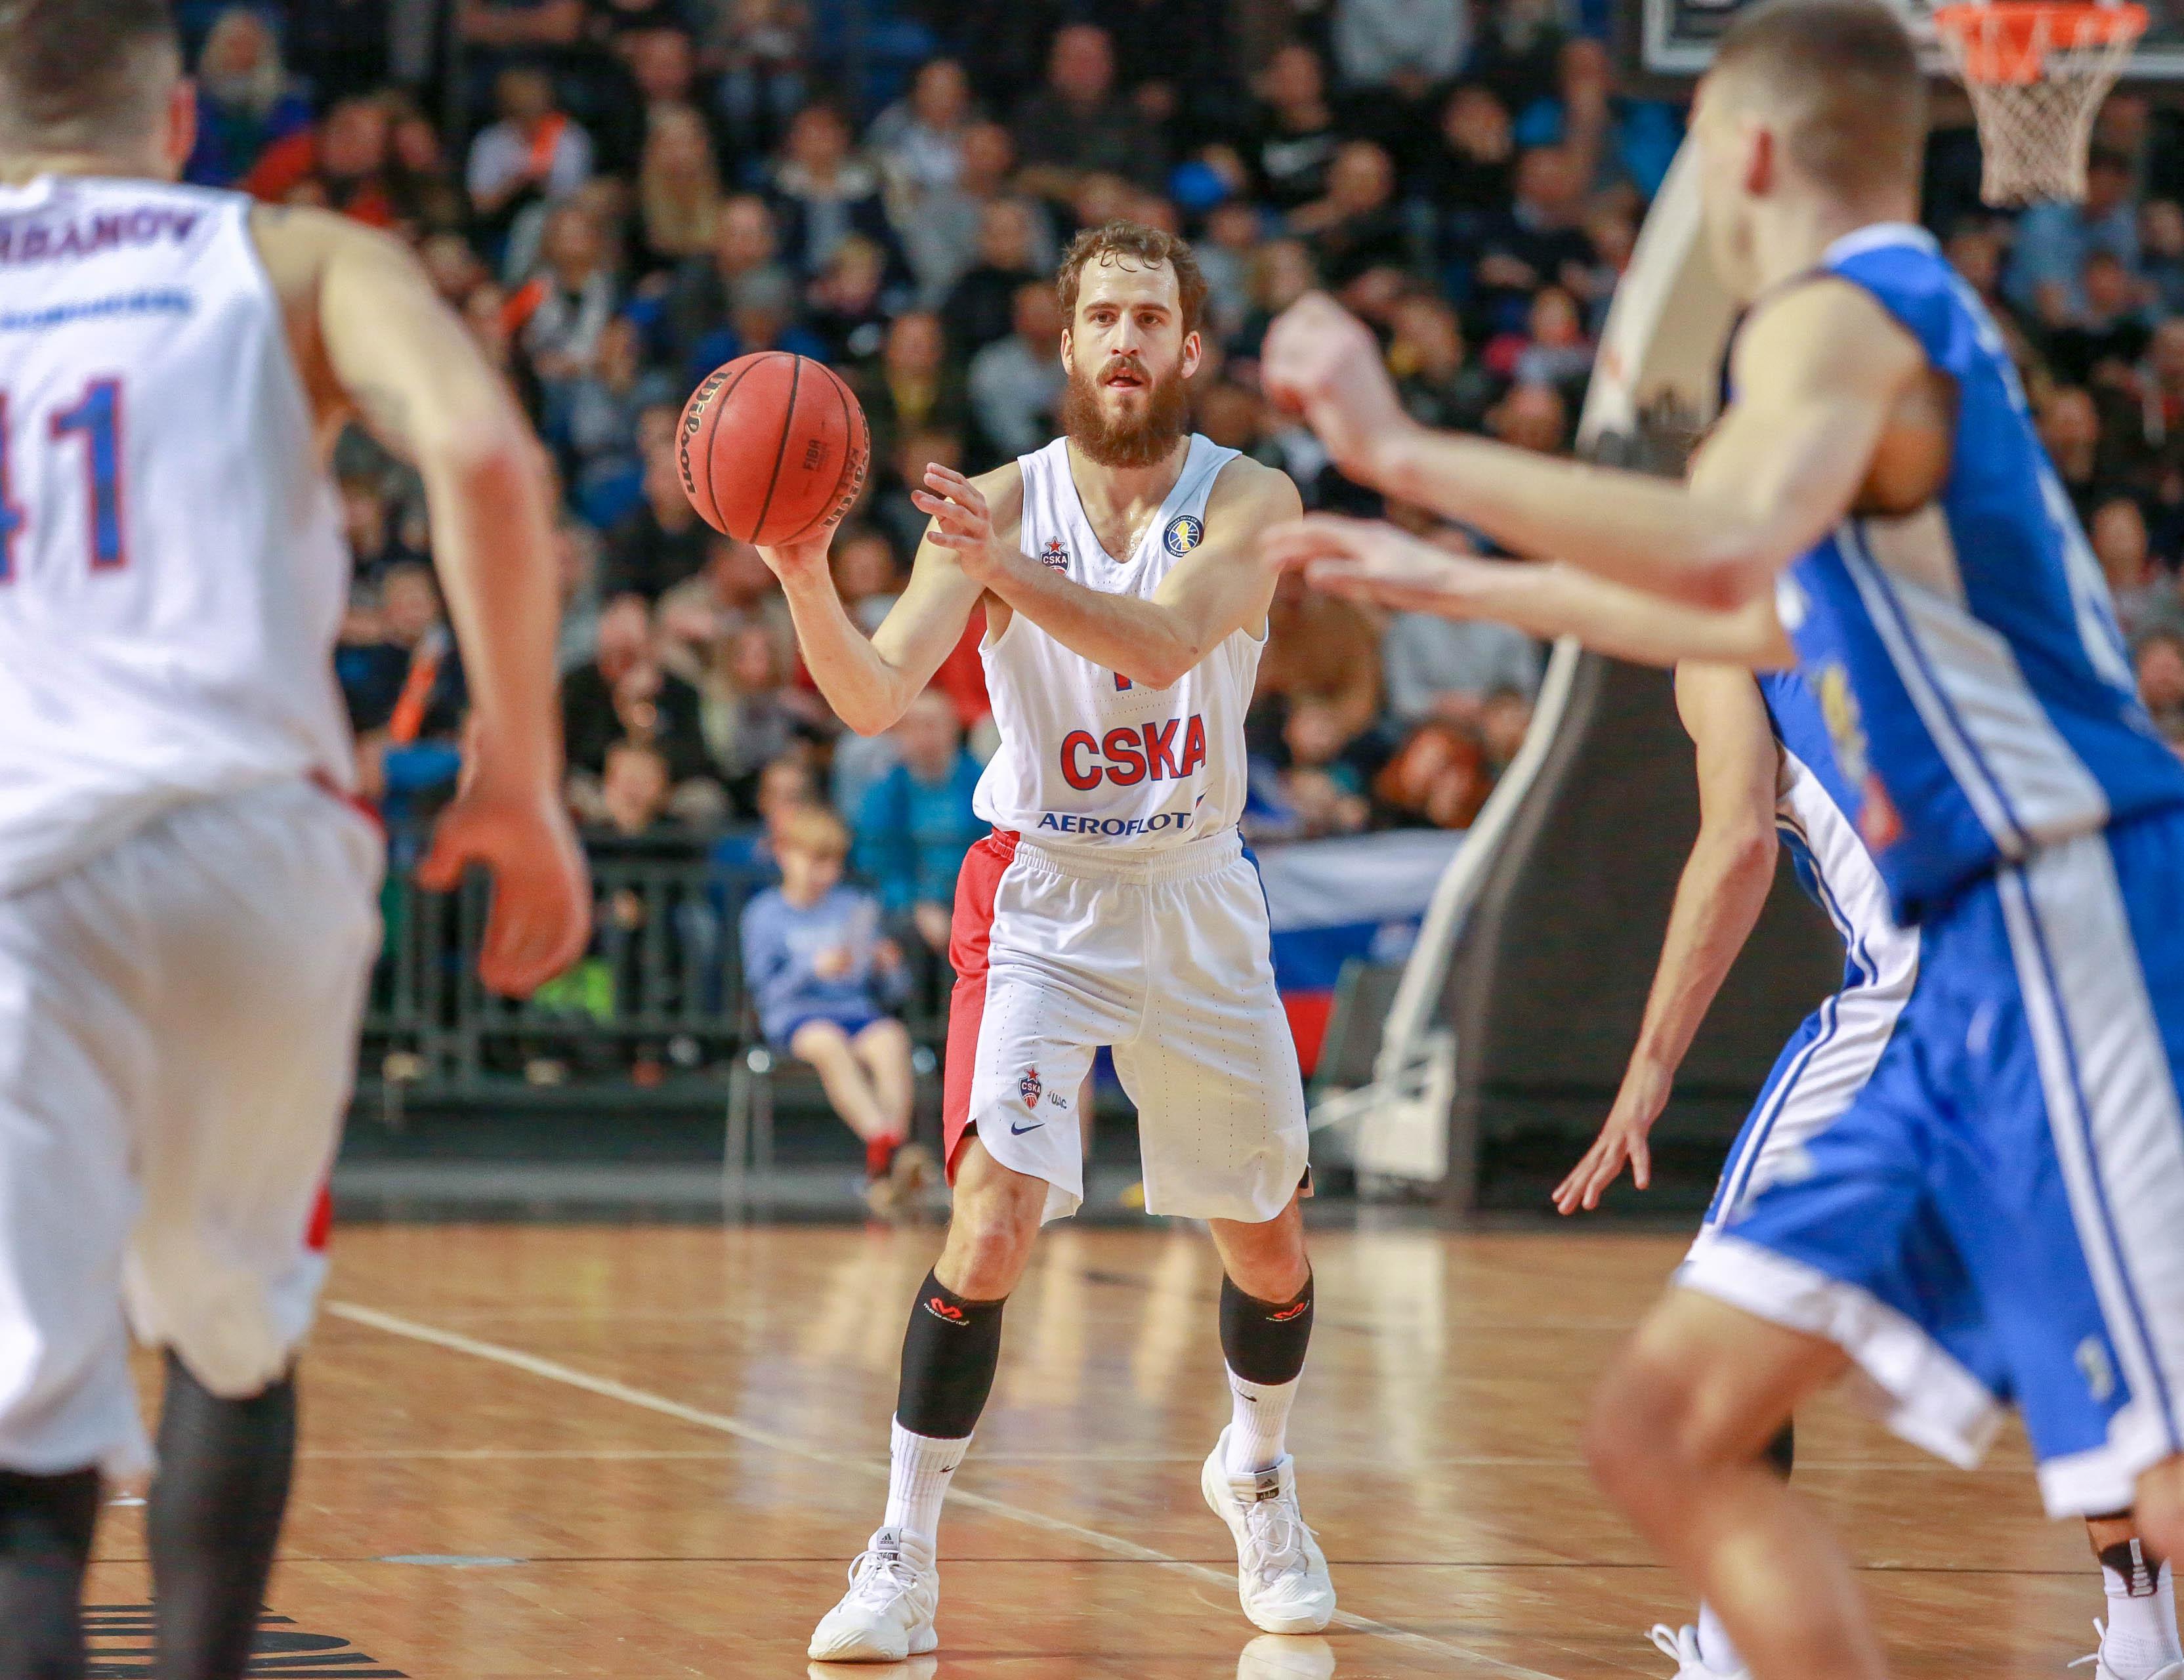 CSKA In Tallinn: Sold-Out Arena, Hard-Fought Win